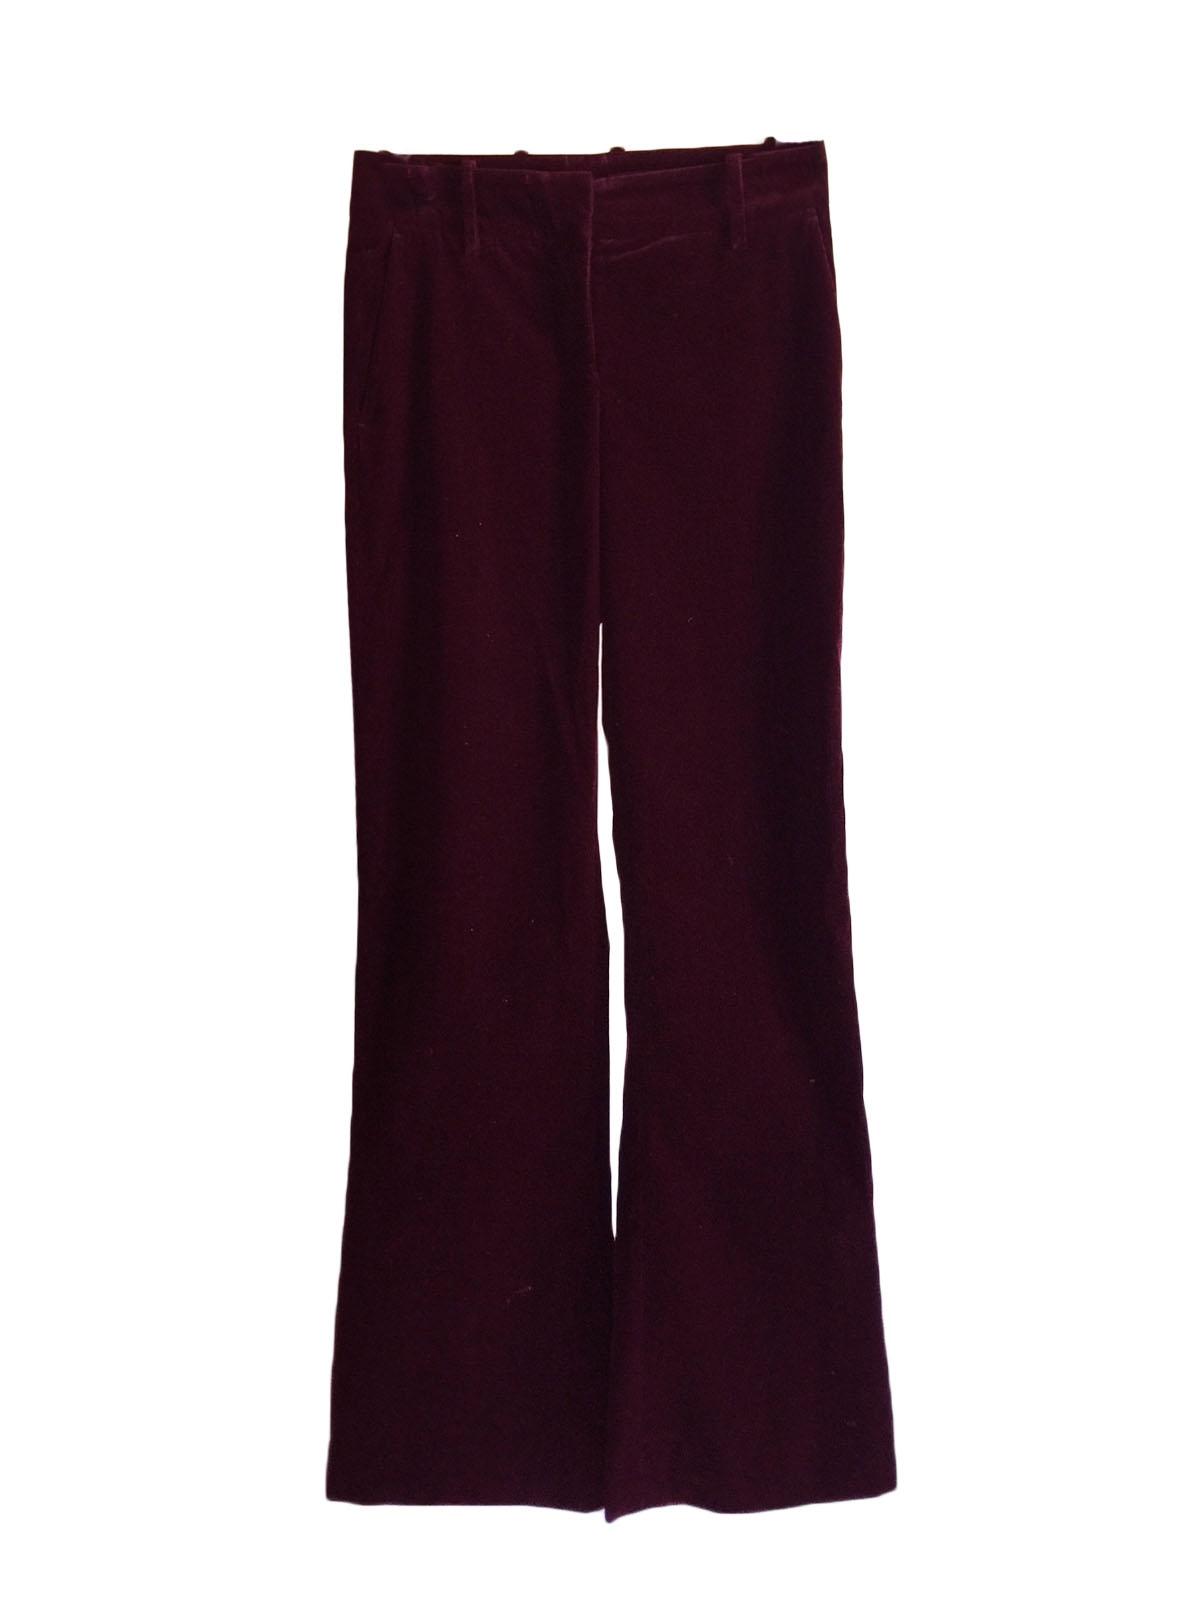 664455d297 Louise Paris - HUGO BOSS Dark burgundy prune corduroy flared pants ...